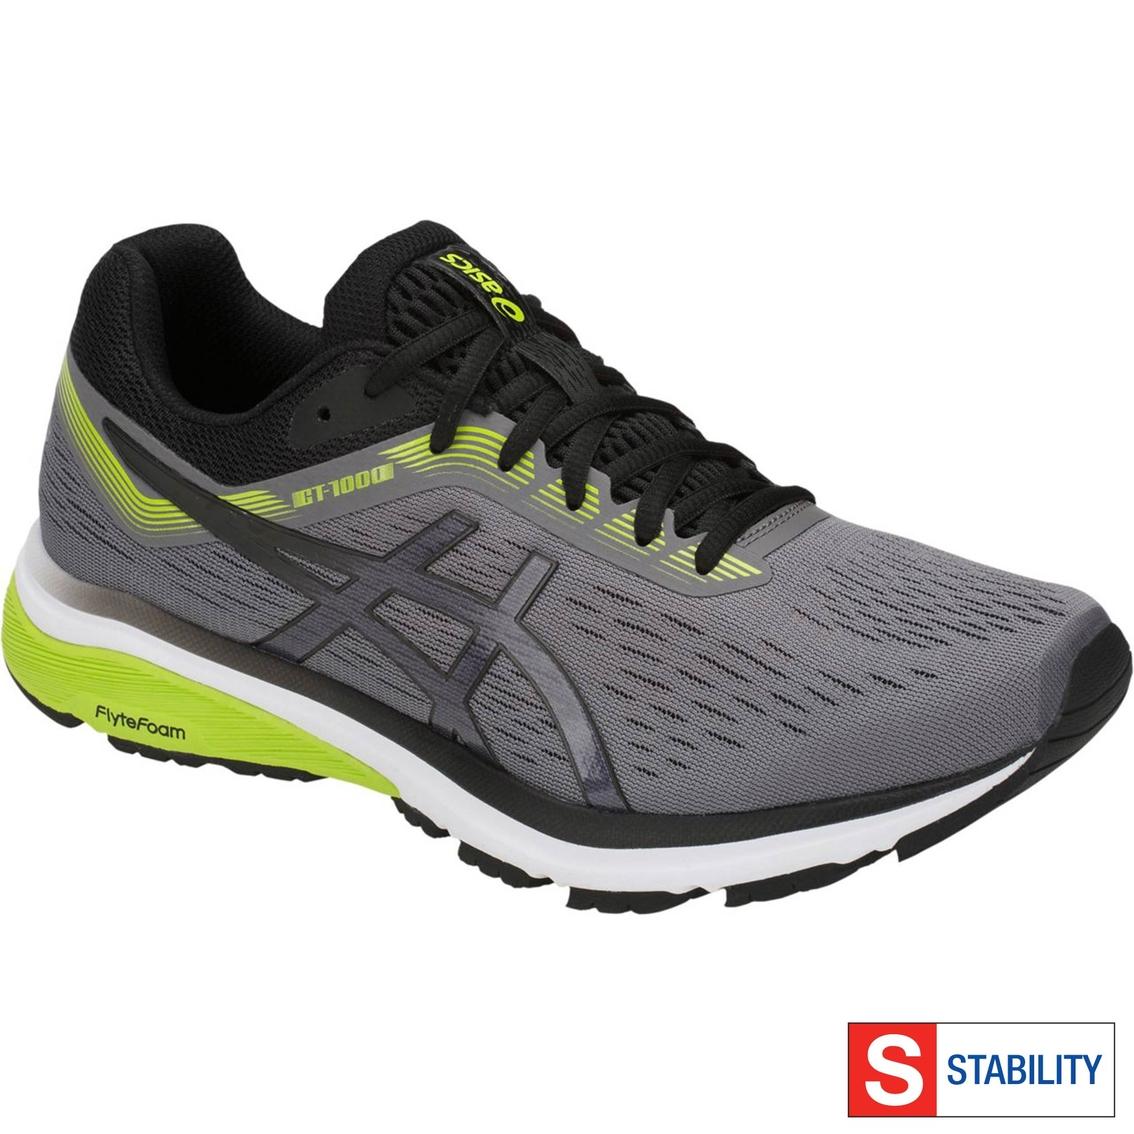 Asics Hommes Gt 1000 1000 7 Hommes Chaussures de course course | 93117f9 - siframistraleonarda.info